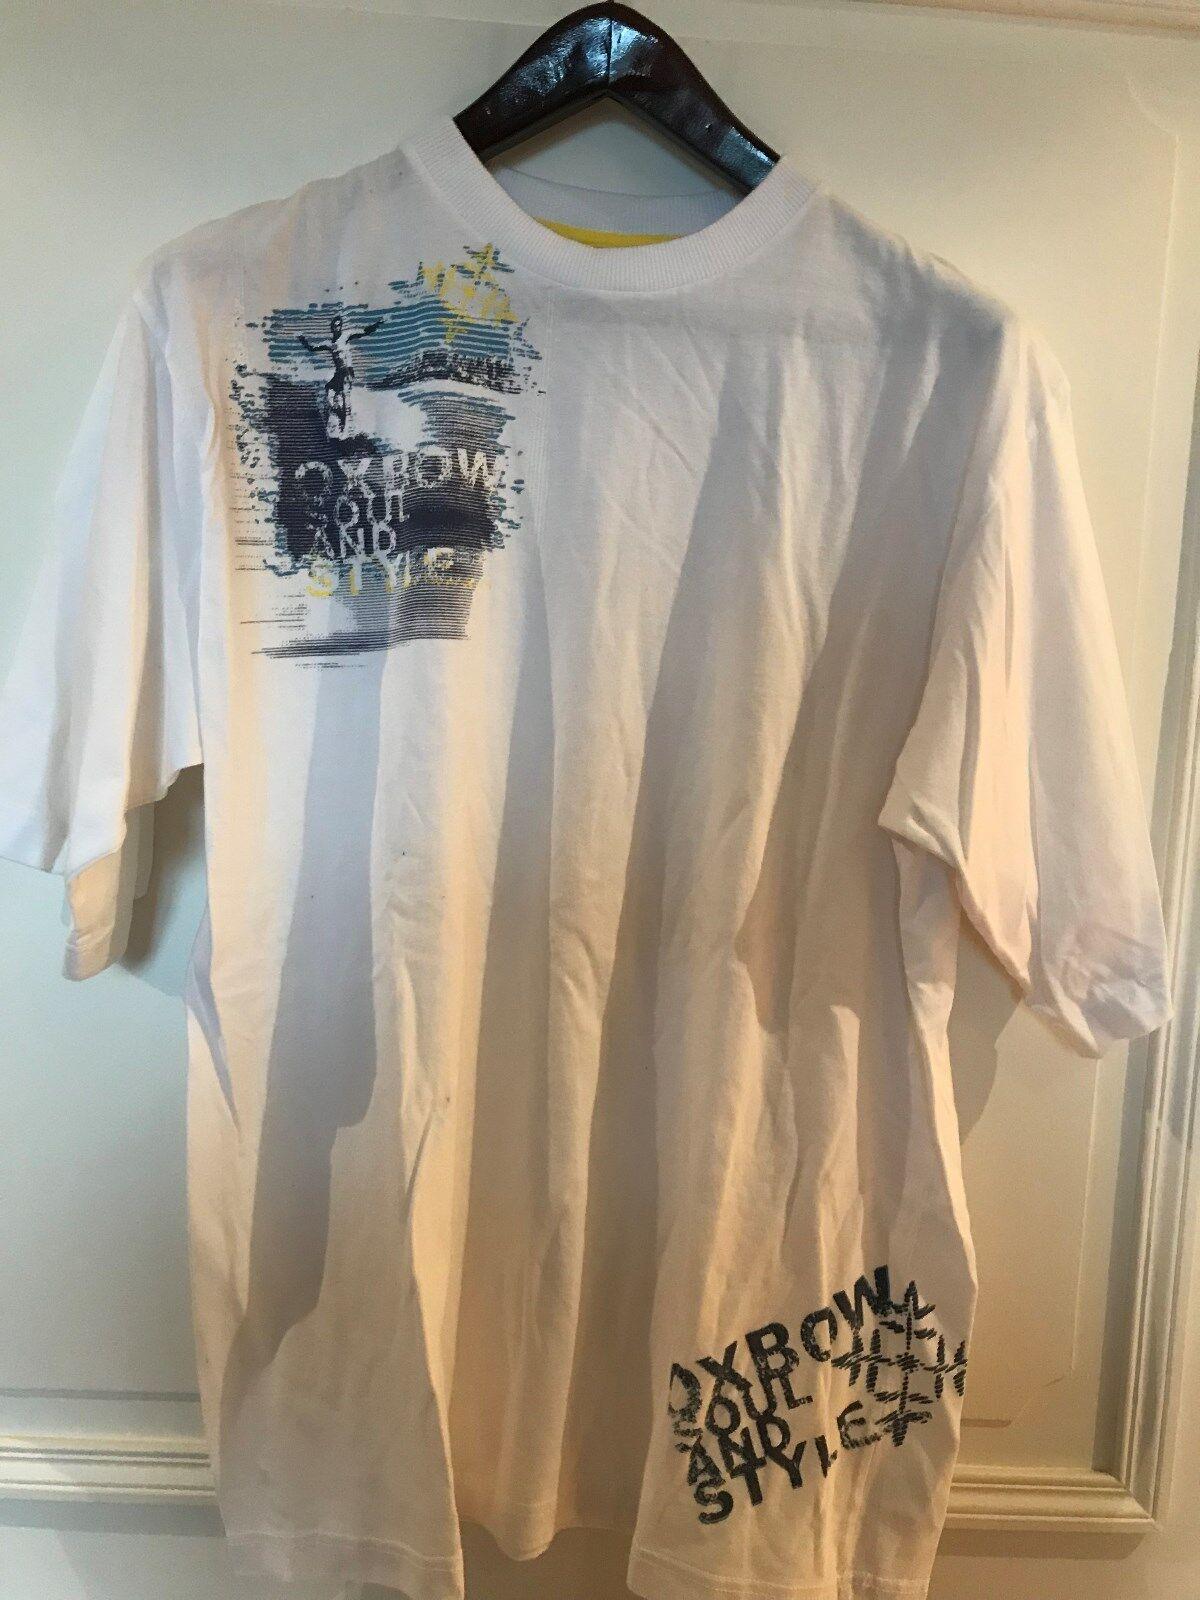 Tee shirt coton marque oxbow taille 16 medium